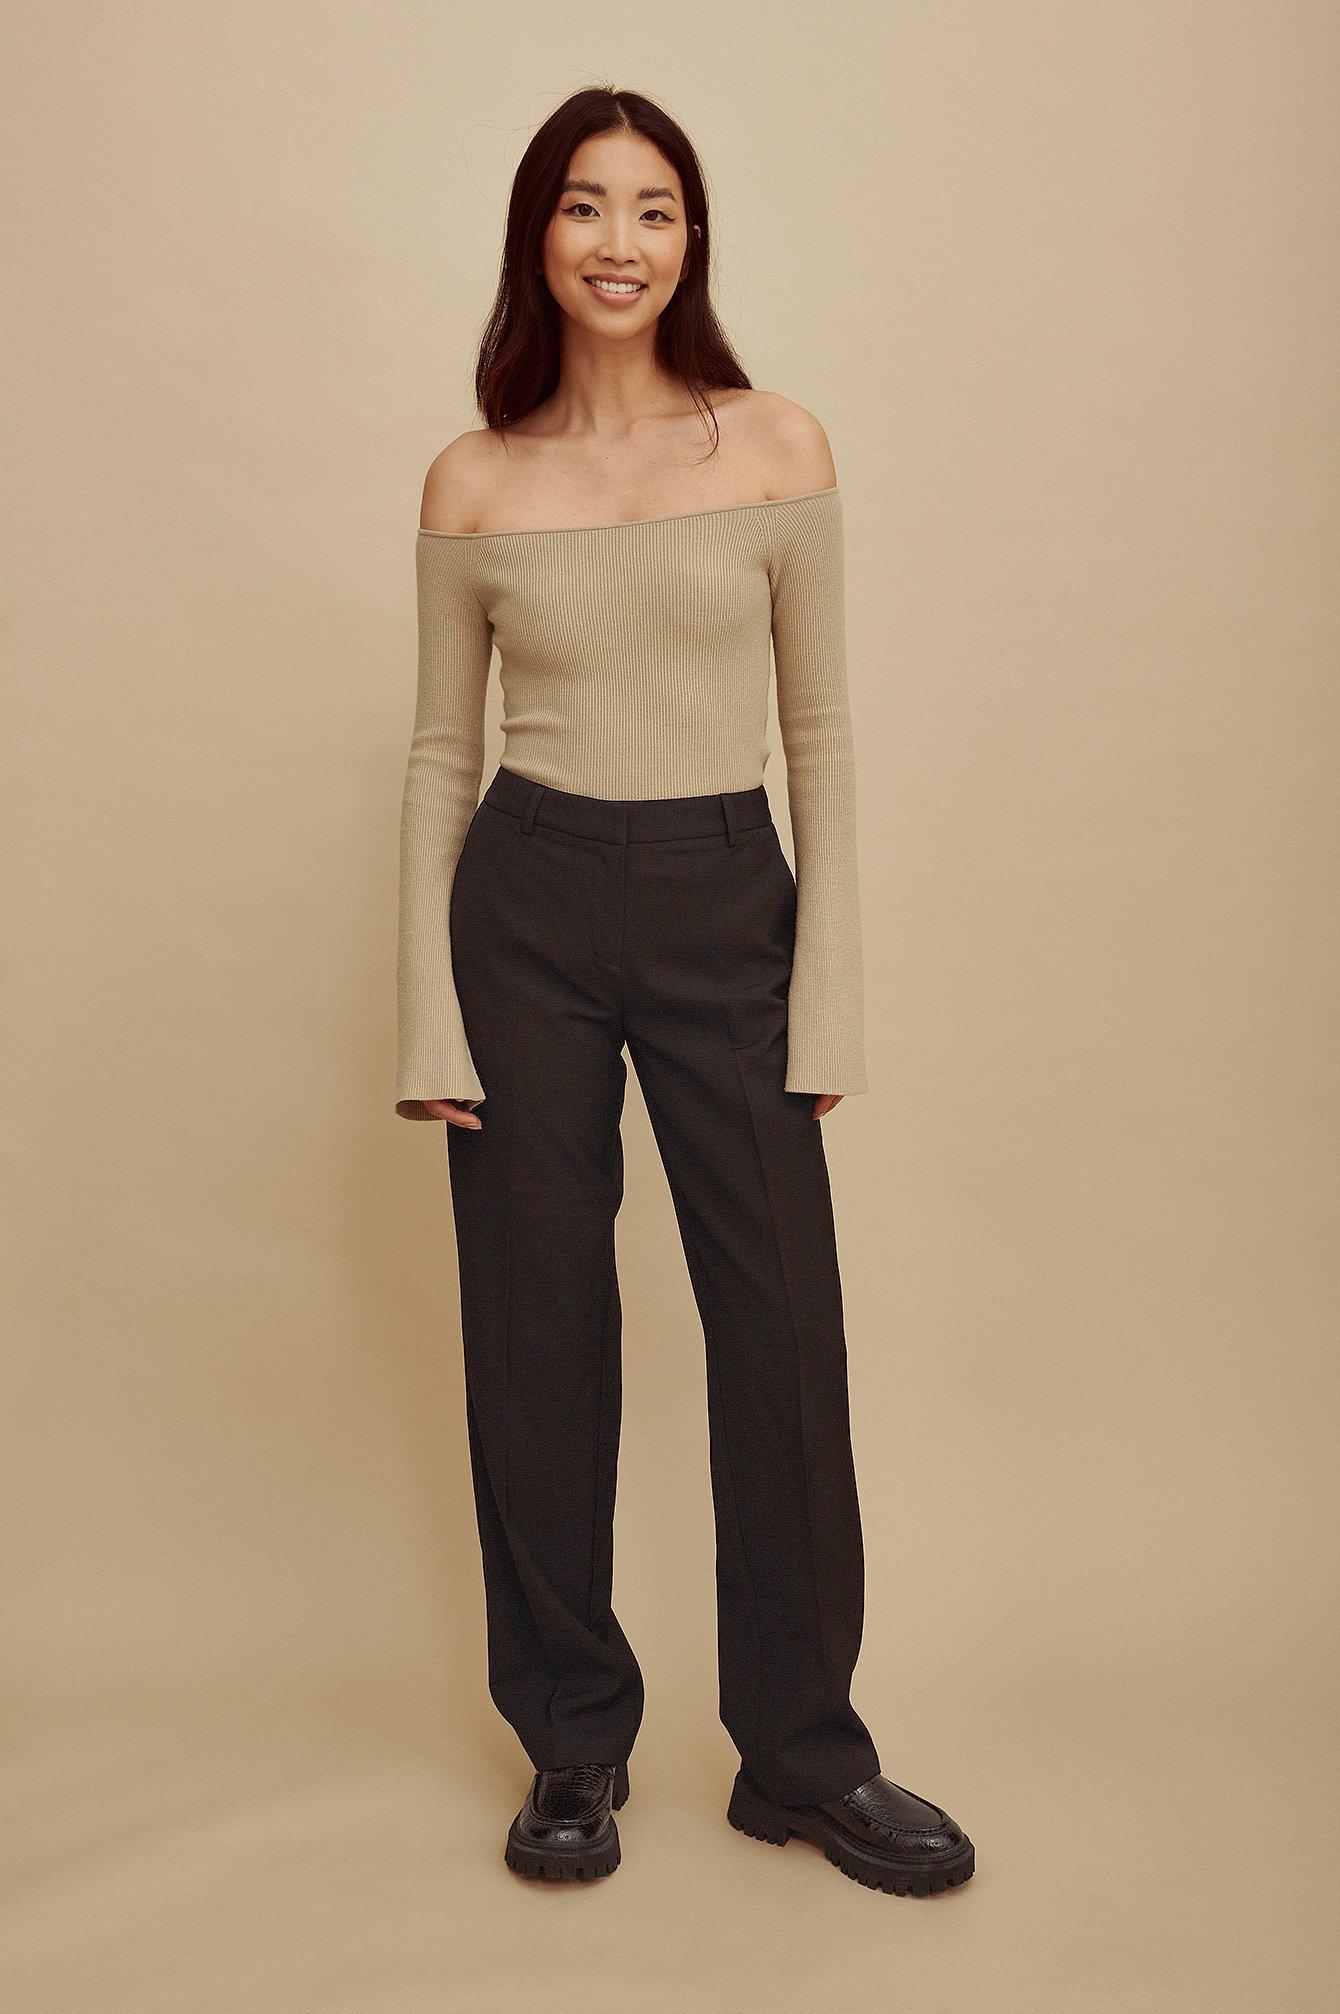 Amalie Star x NA-KD Genanvendte habitbukser med middelhøj talje - Black